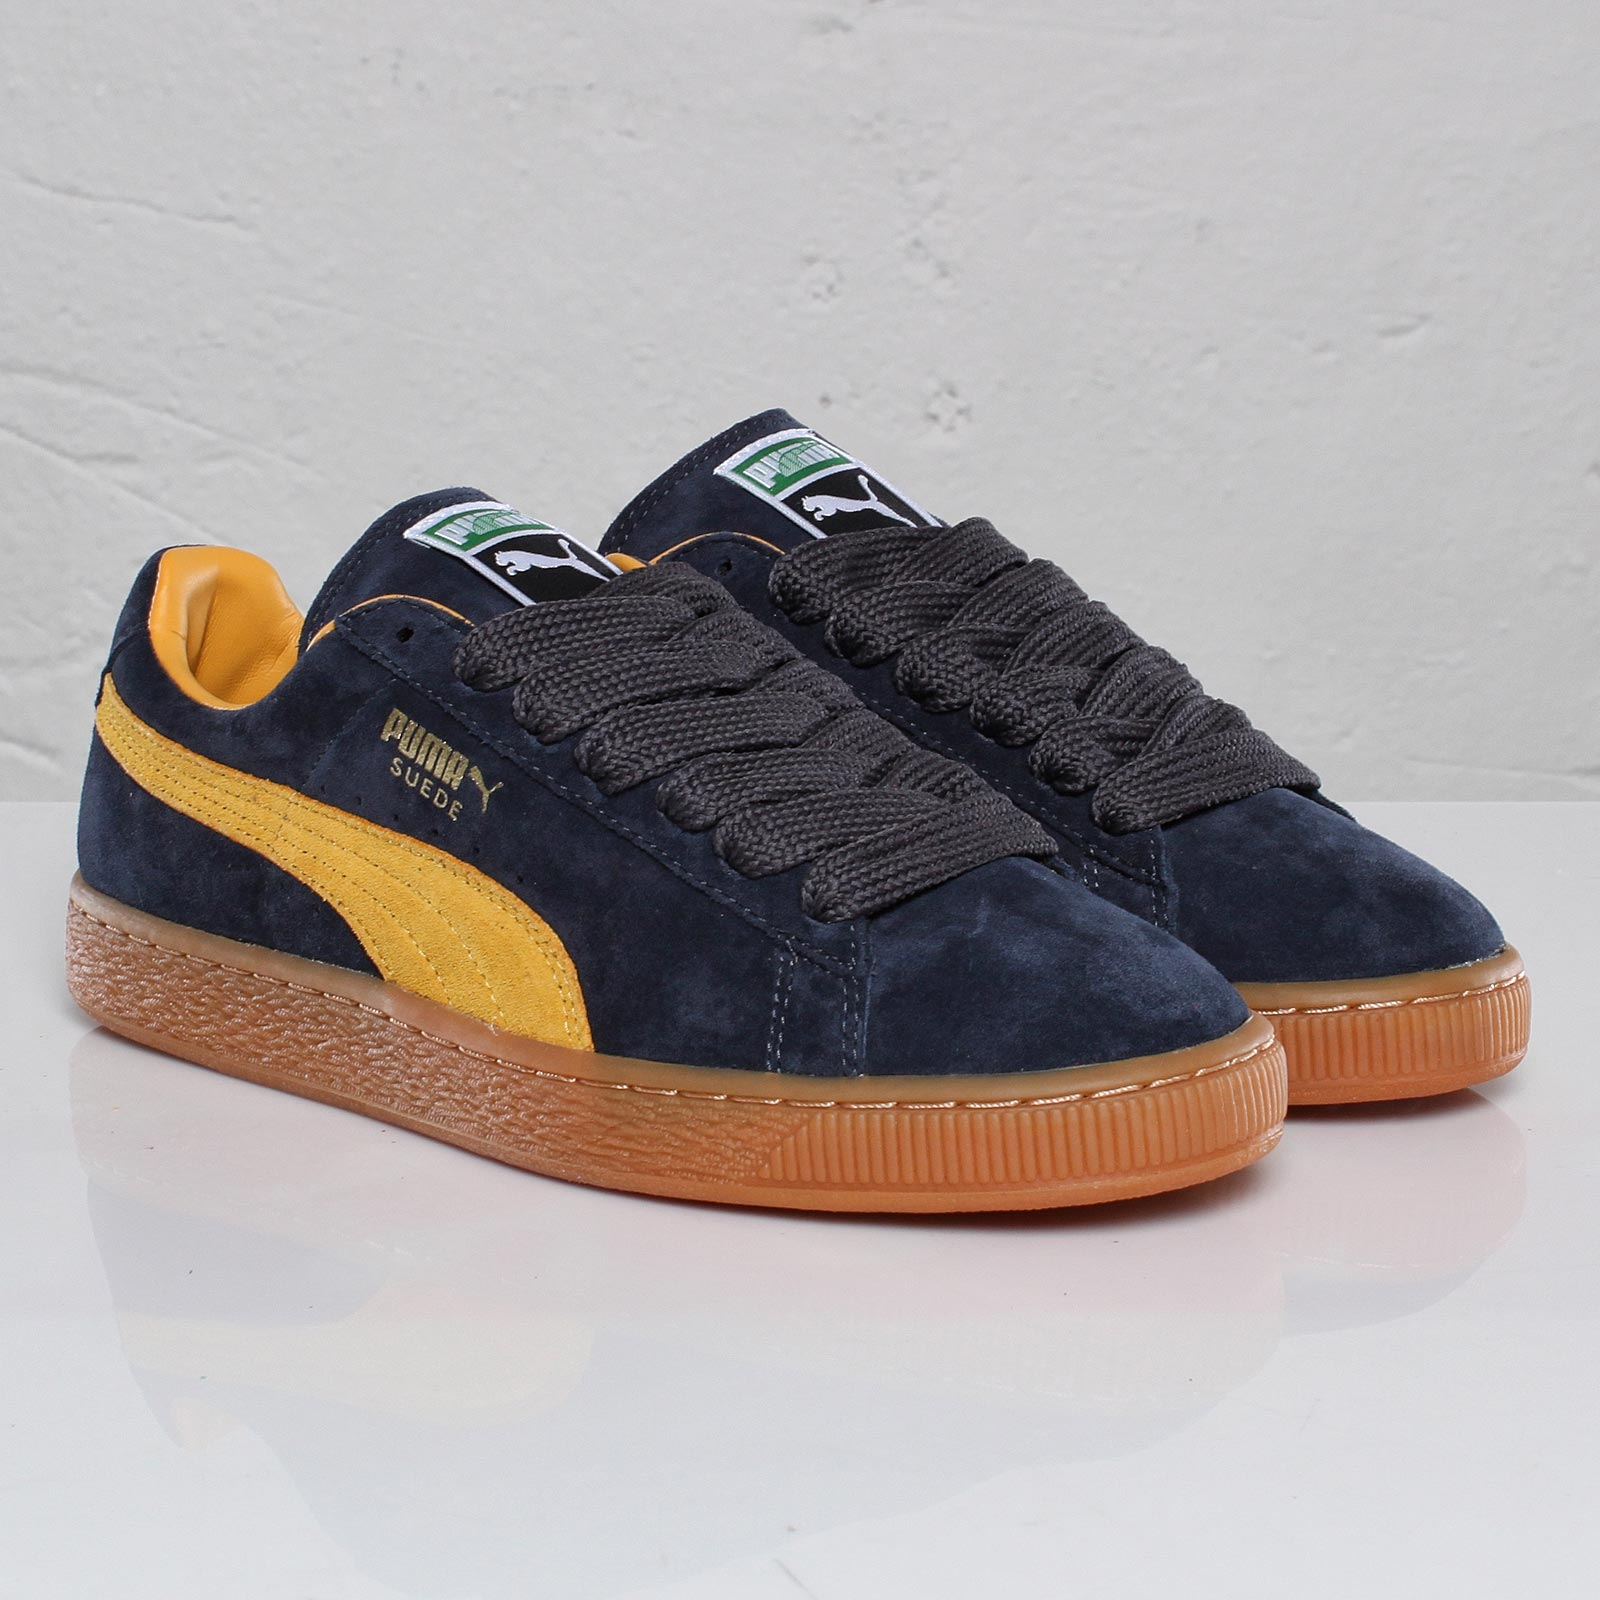 7c089ba9720 Puma Suede Classic ECO - 101613 - Sneakersnstuff | sneakers ...